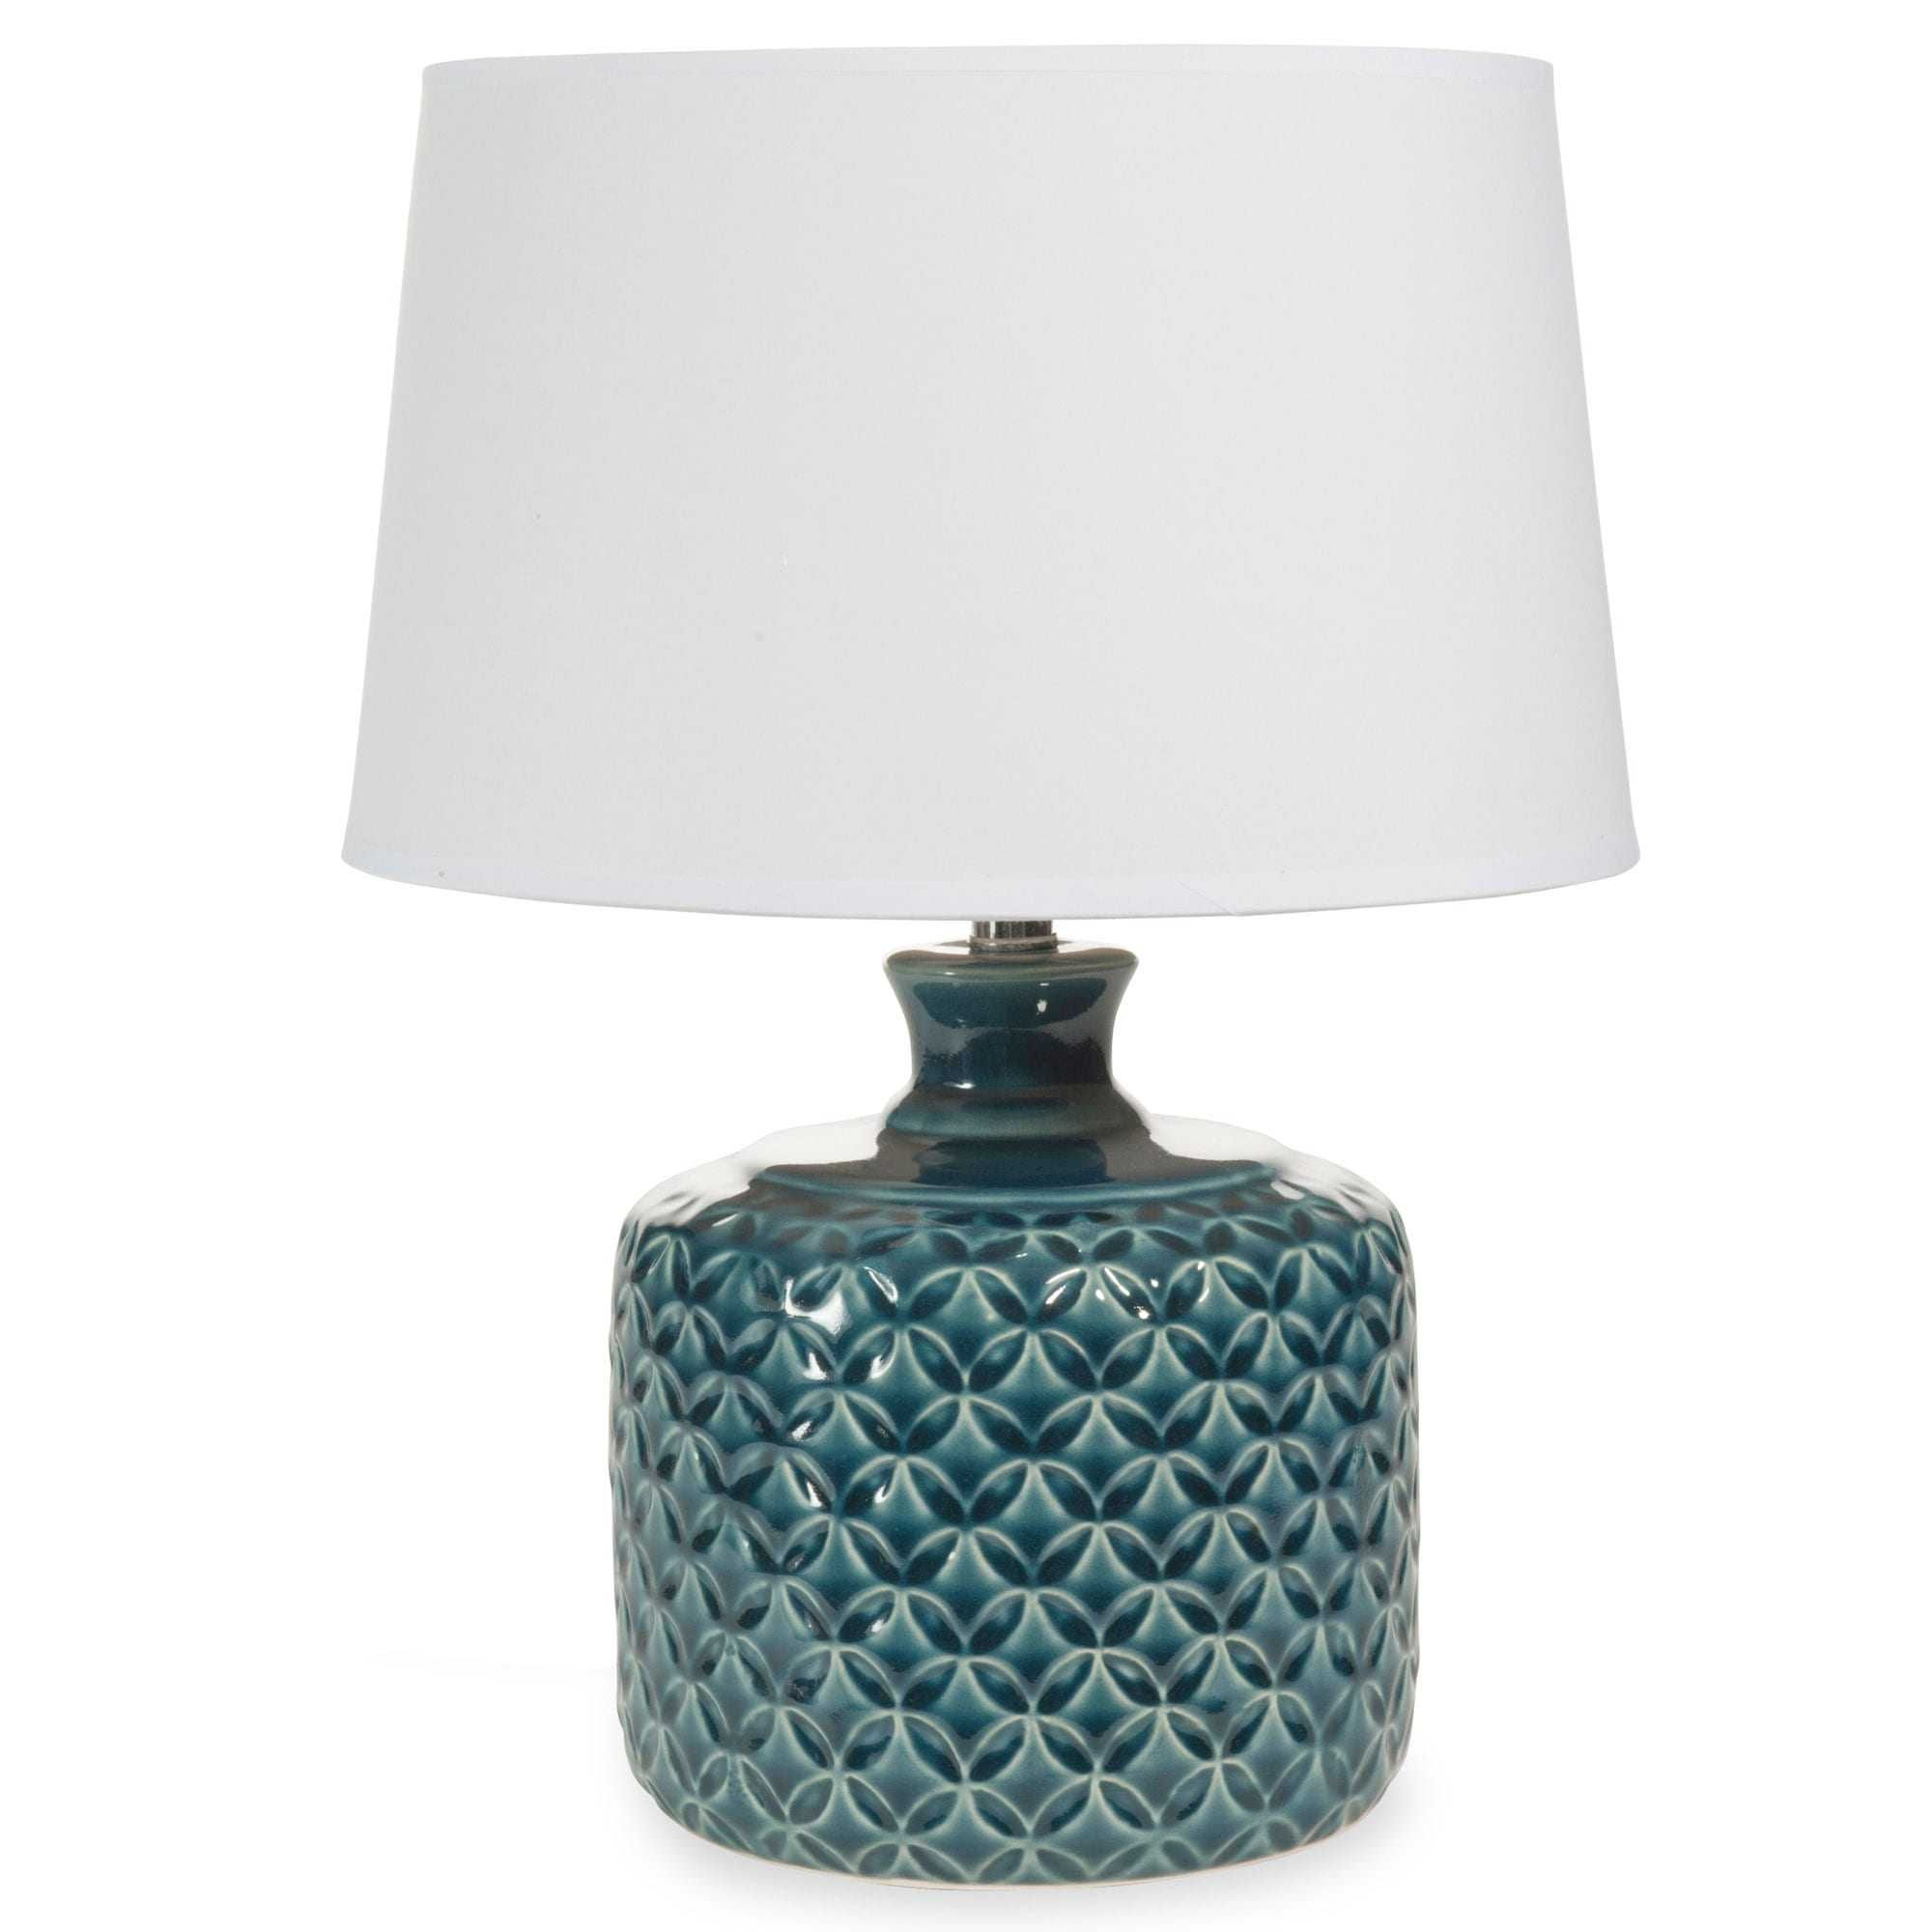 Lampe En Céramique Bleue H 34 Cm Porto Lámparas De Cerámica Cerámica Azul Bases De Lámpara